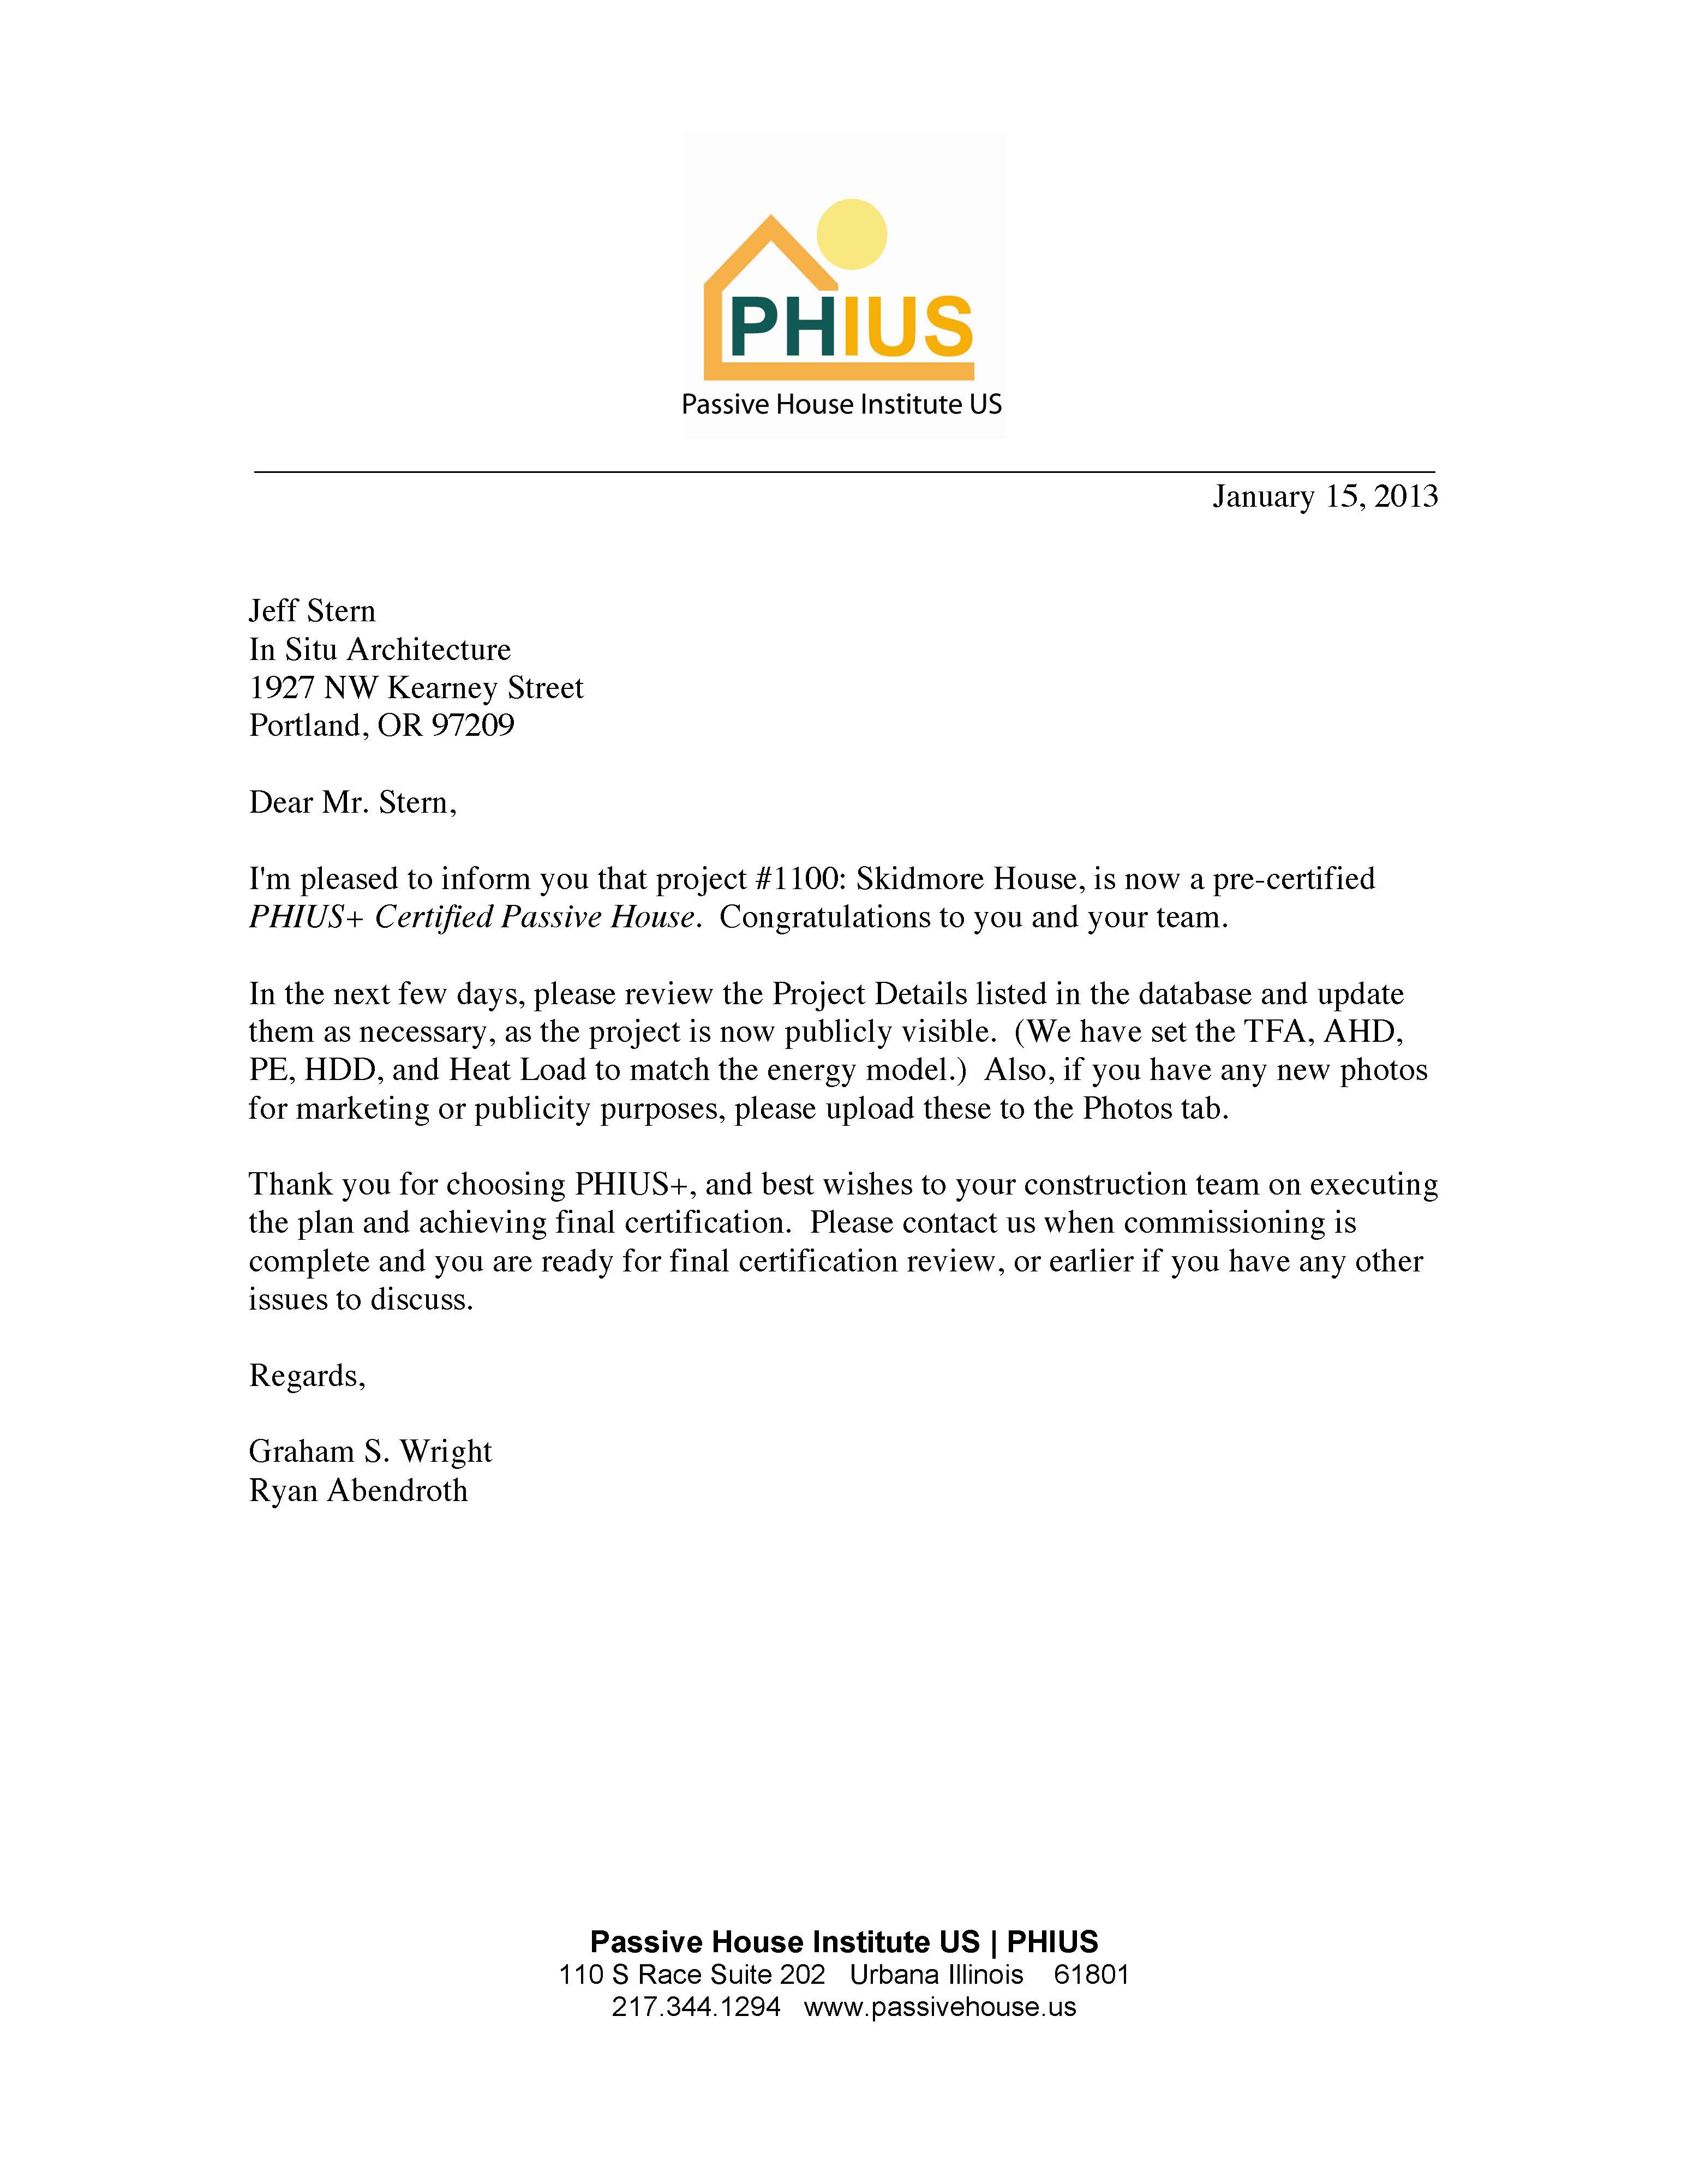 Certification Letter For Construction Work Resume Pdf Download